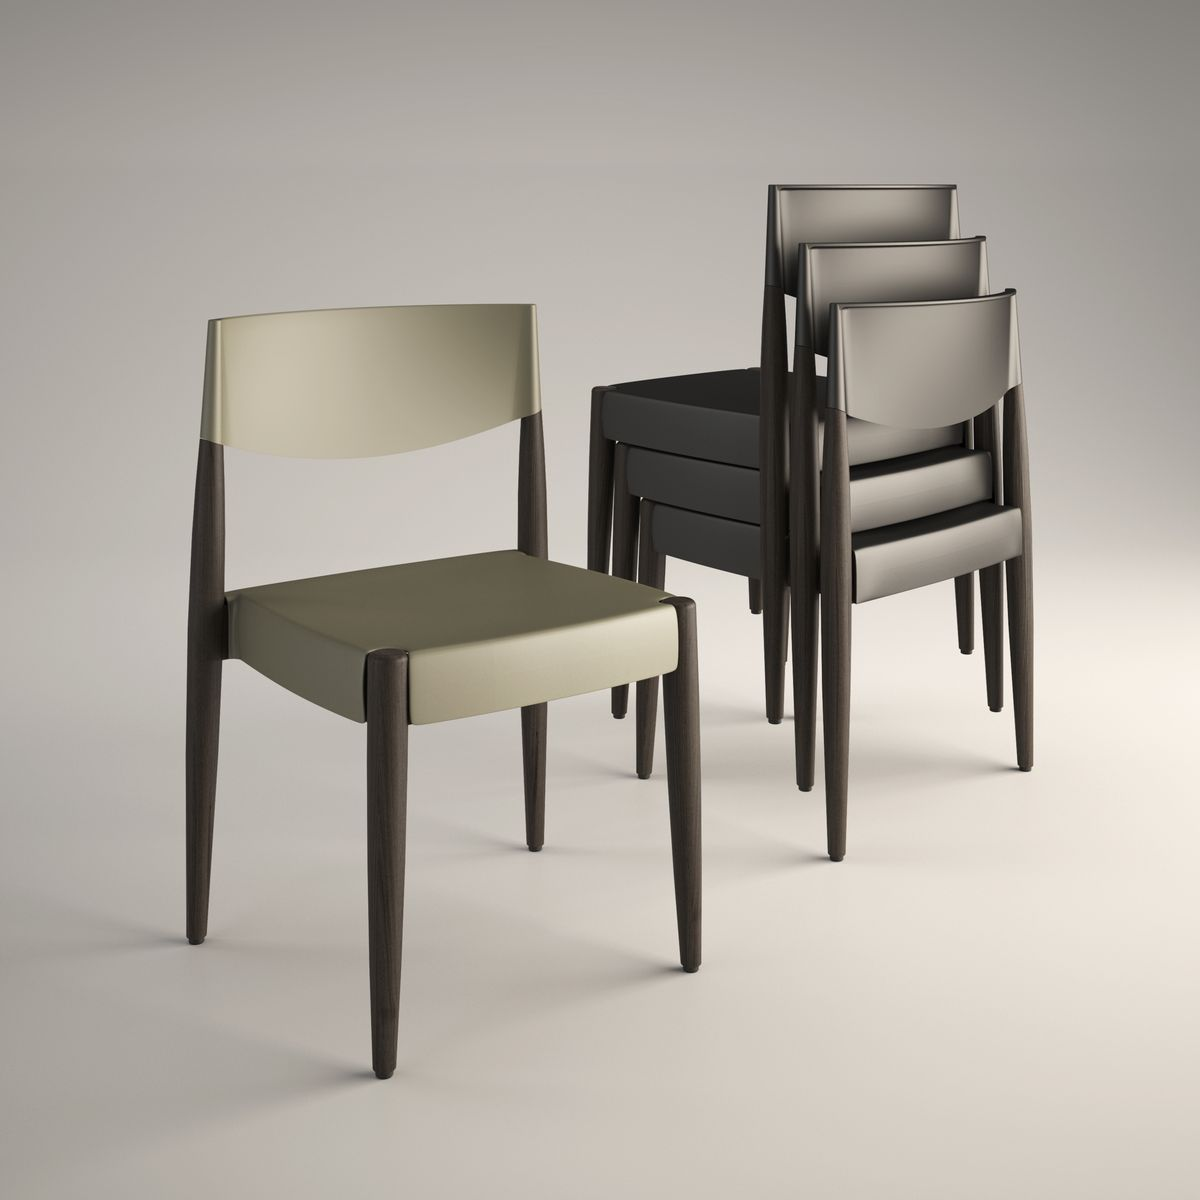 Virna chair, Alma Design